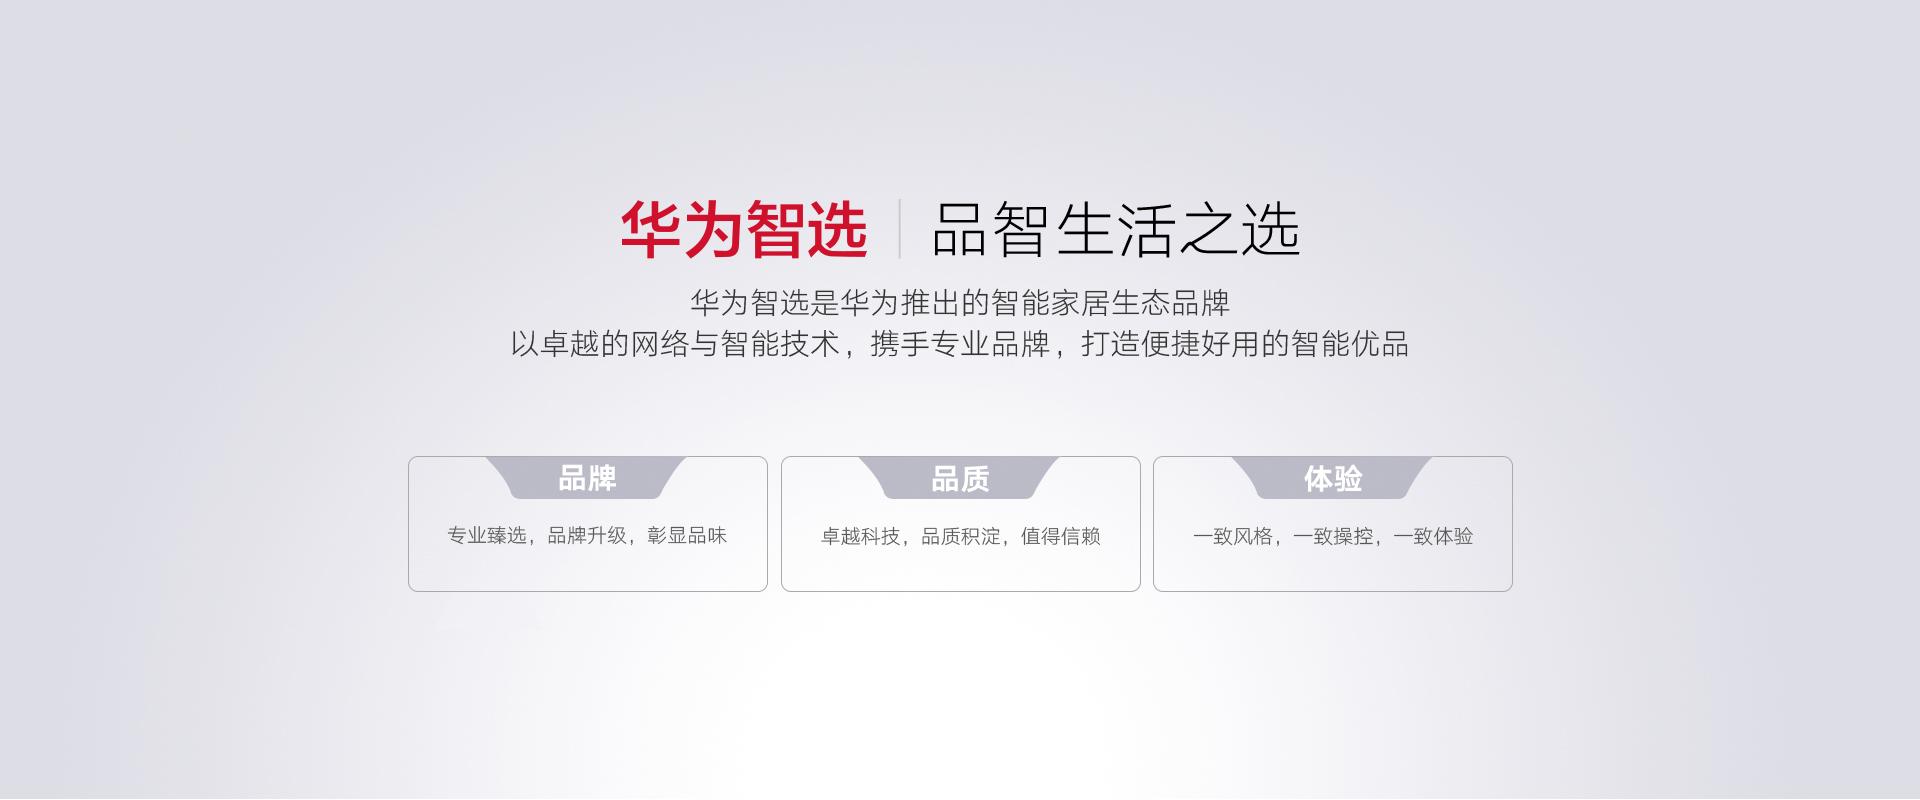 p1-华为智选品牌页.jpg